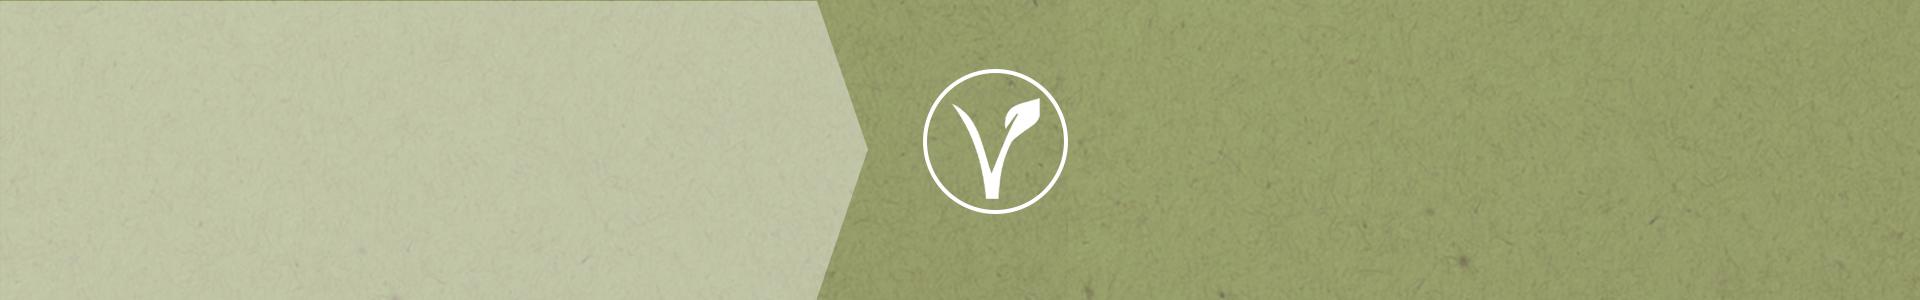 green vegan textured background.